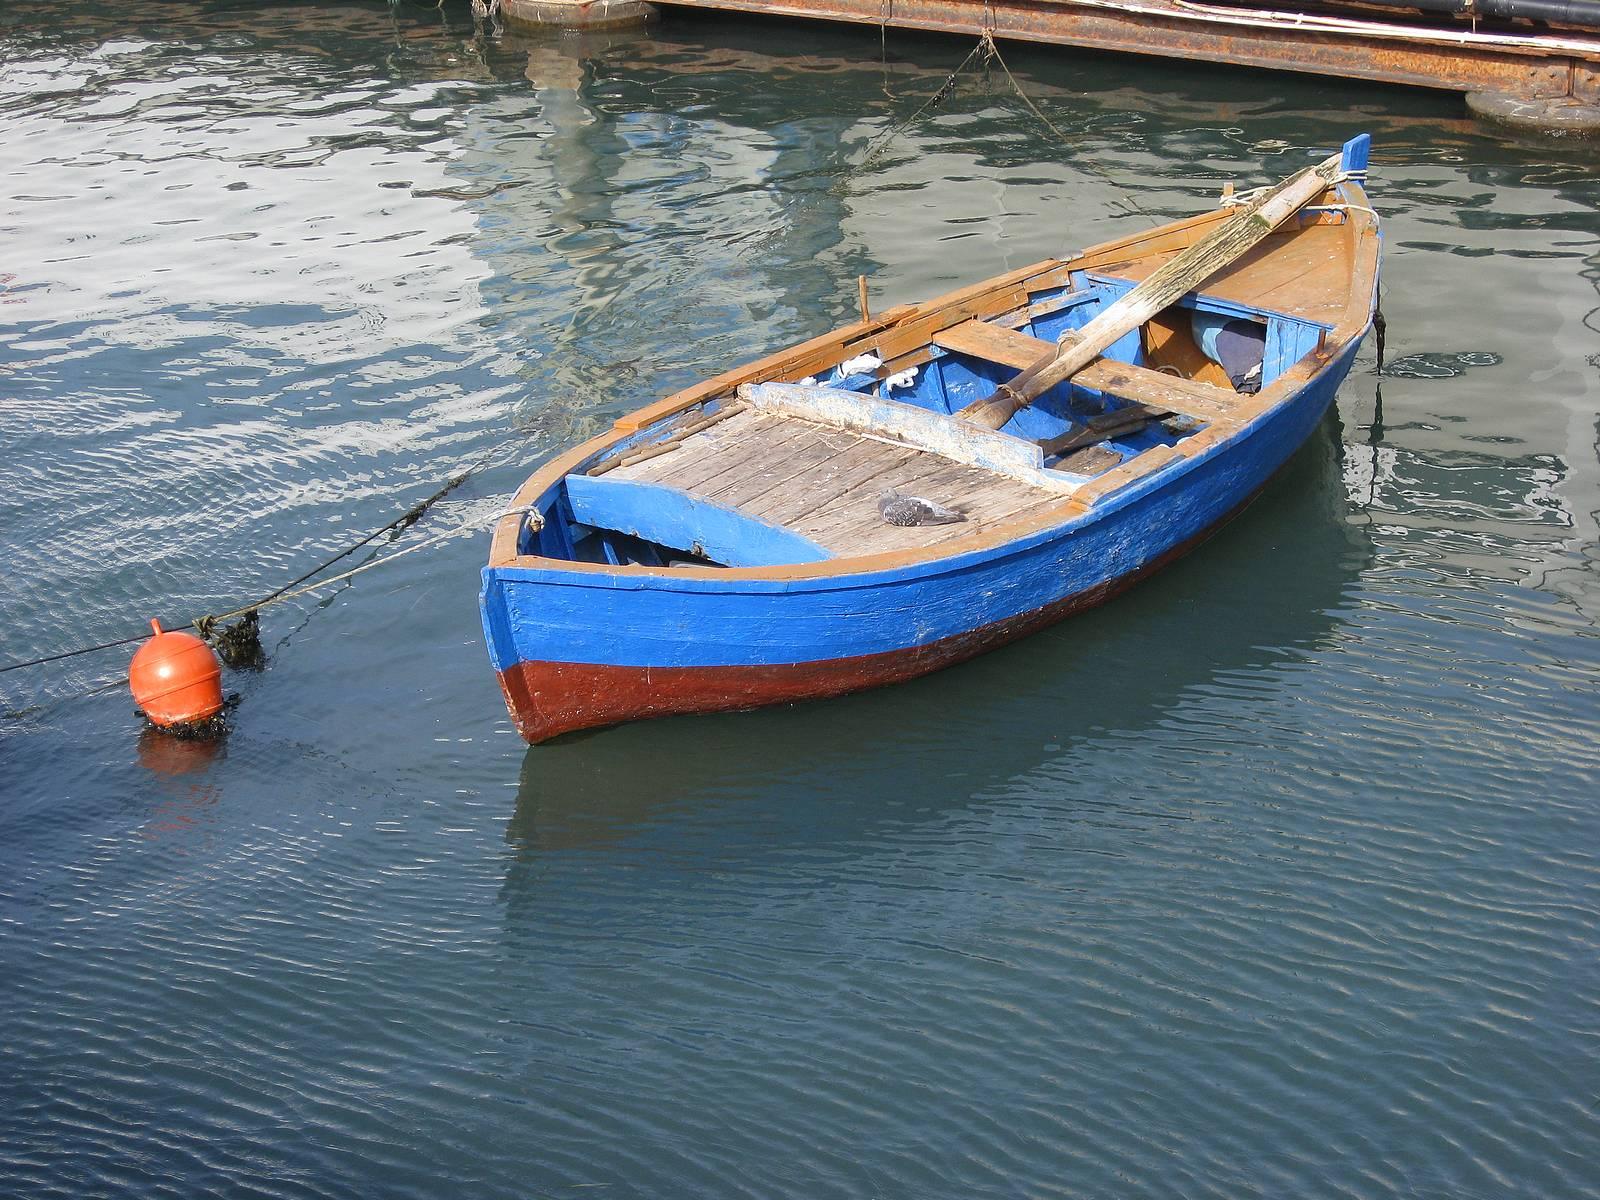 Photo of الدرك البحري يوقف قاربين متلبسين بجني الطحالب خارج الفترة القانونية